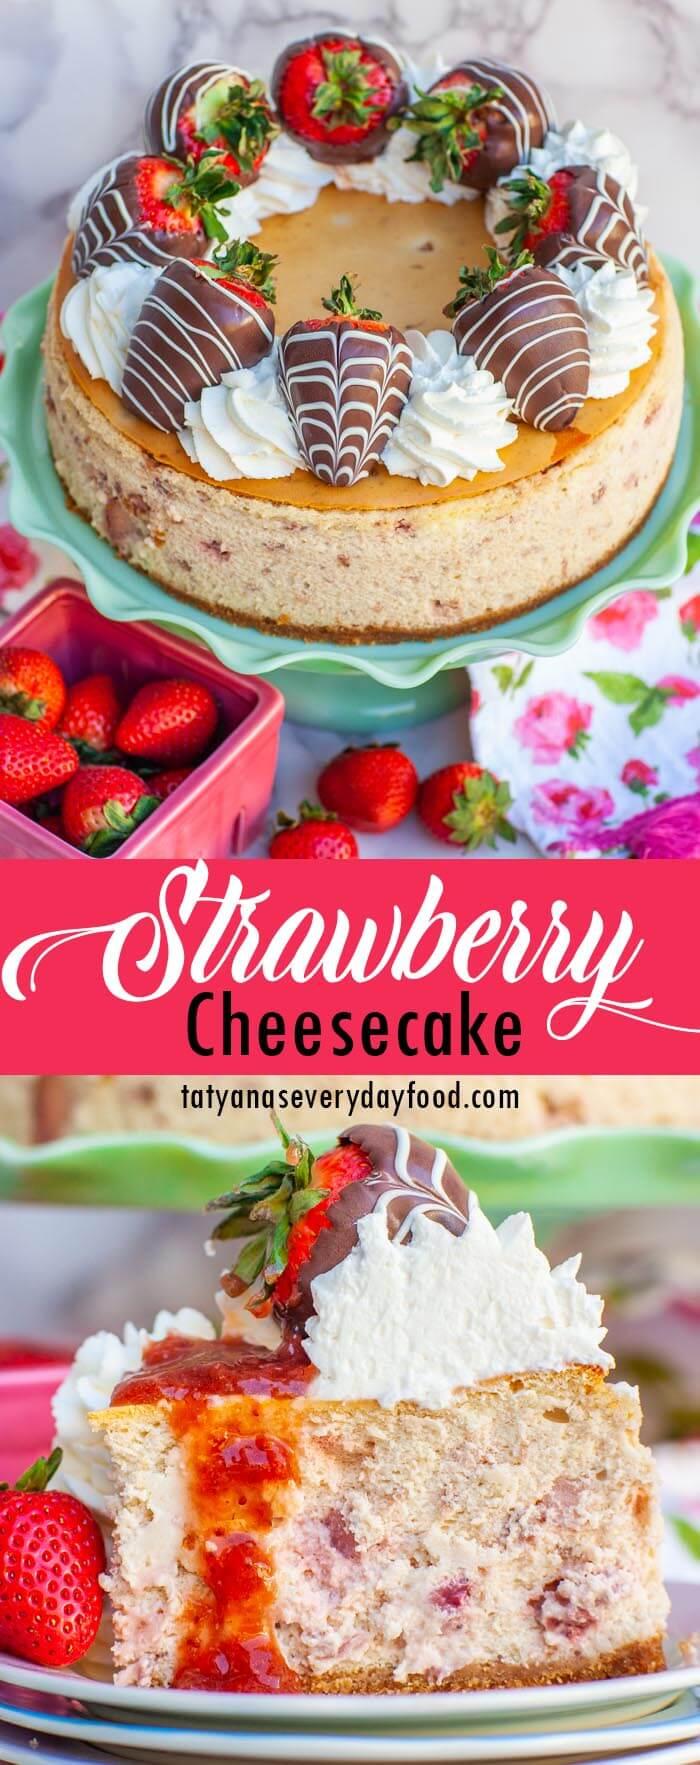 The Best Strawberry Cheesecake video recipe